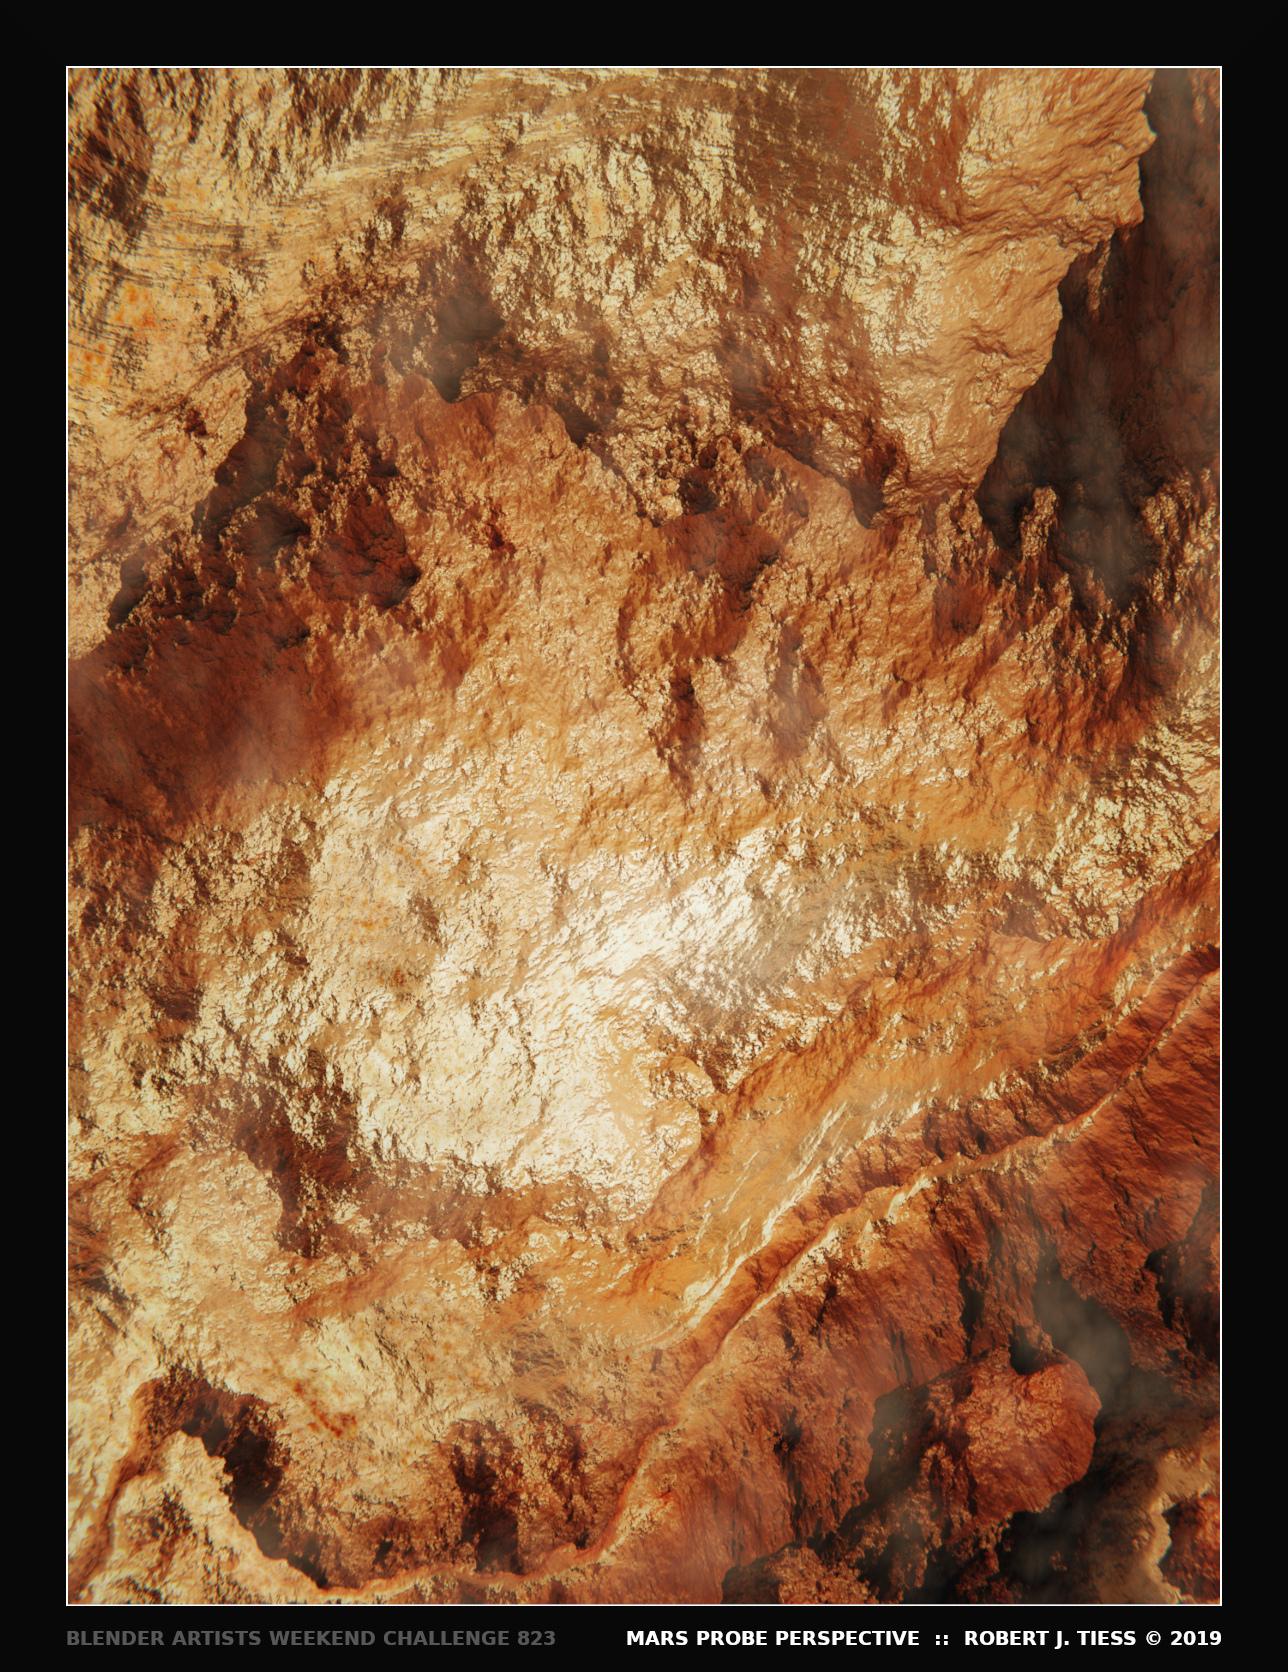 Mars Probe Perspective - By Robert J. Tiess